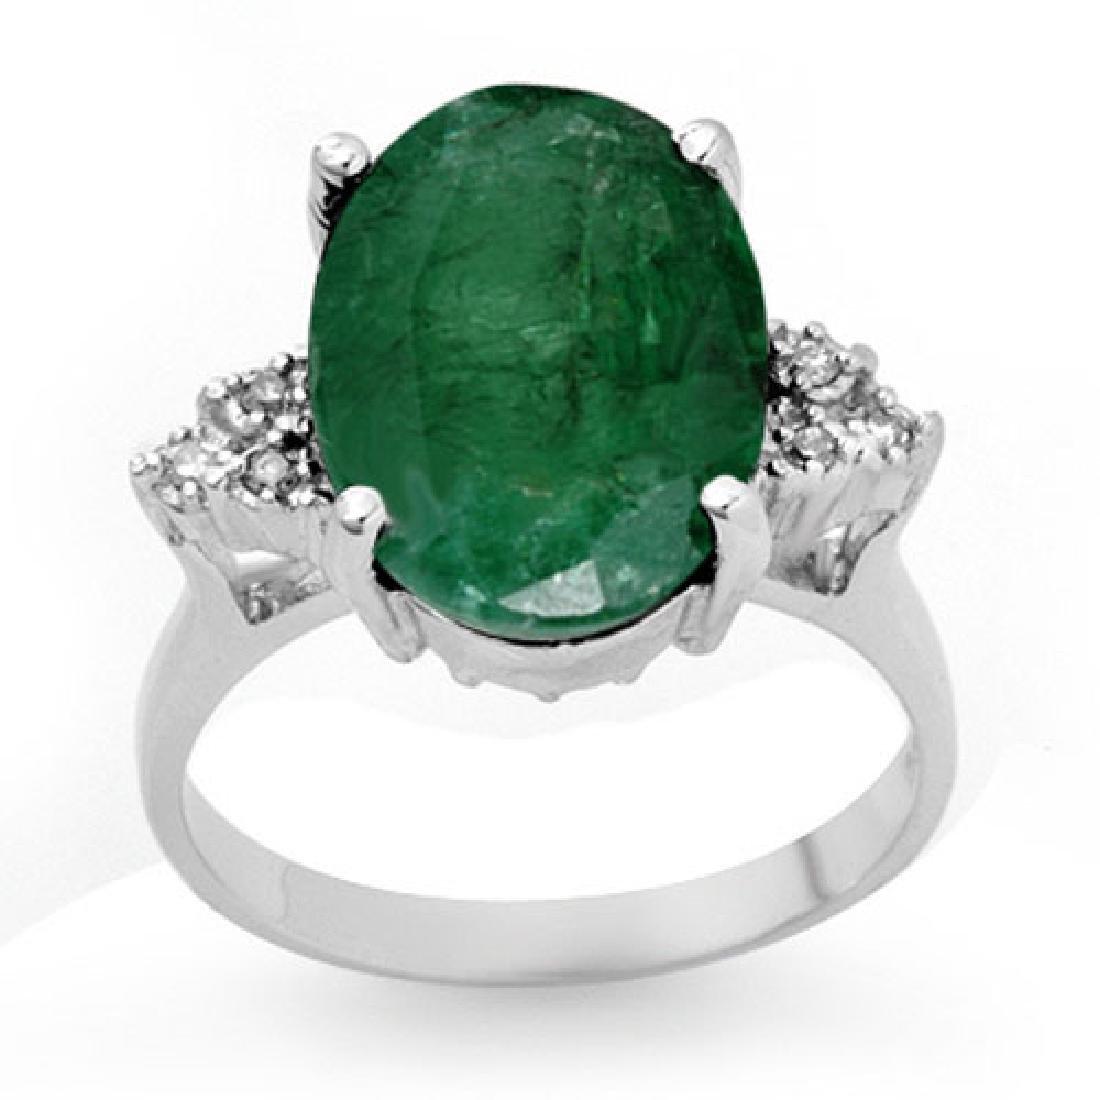 6.35 CTW Emerald & Diamond Ring 10K White Gold